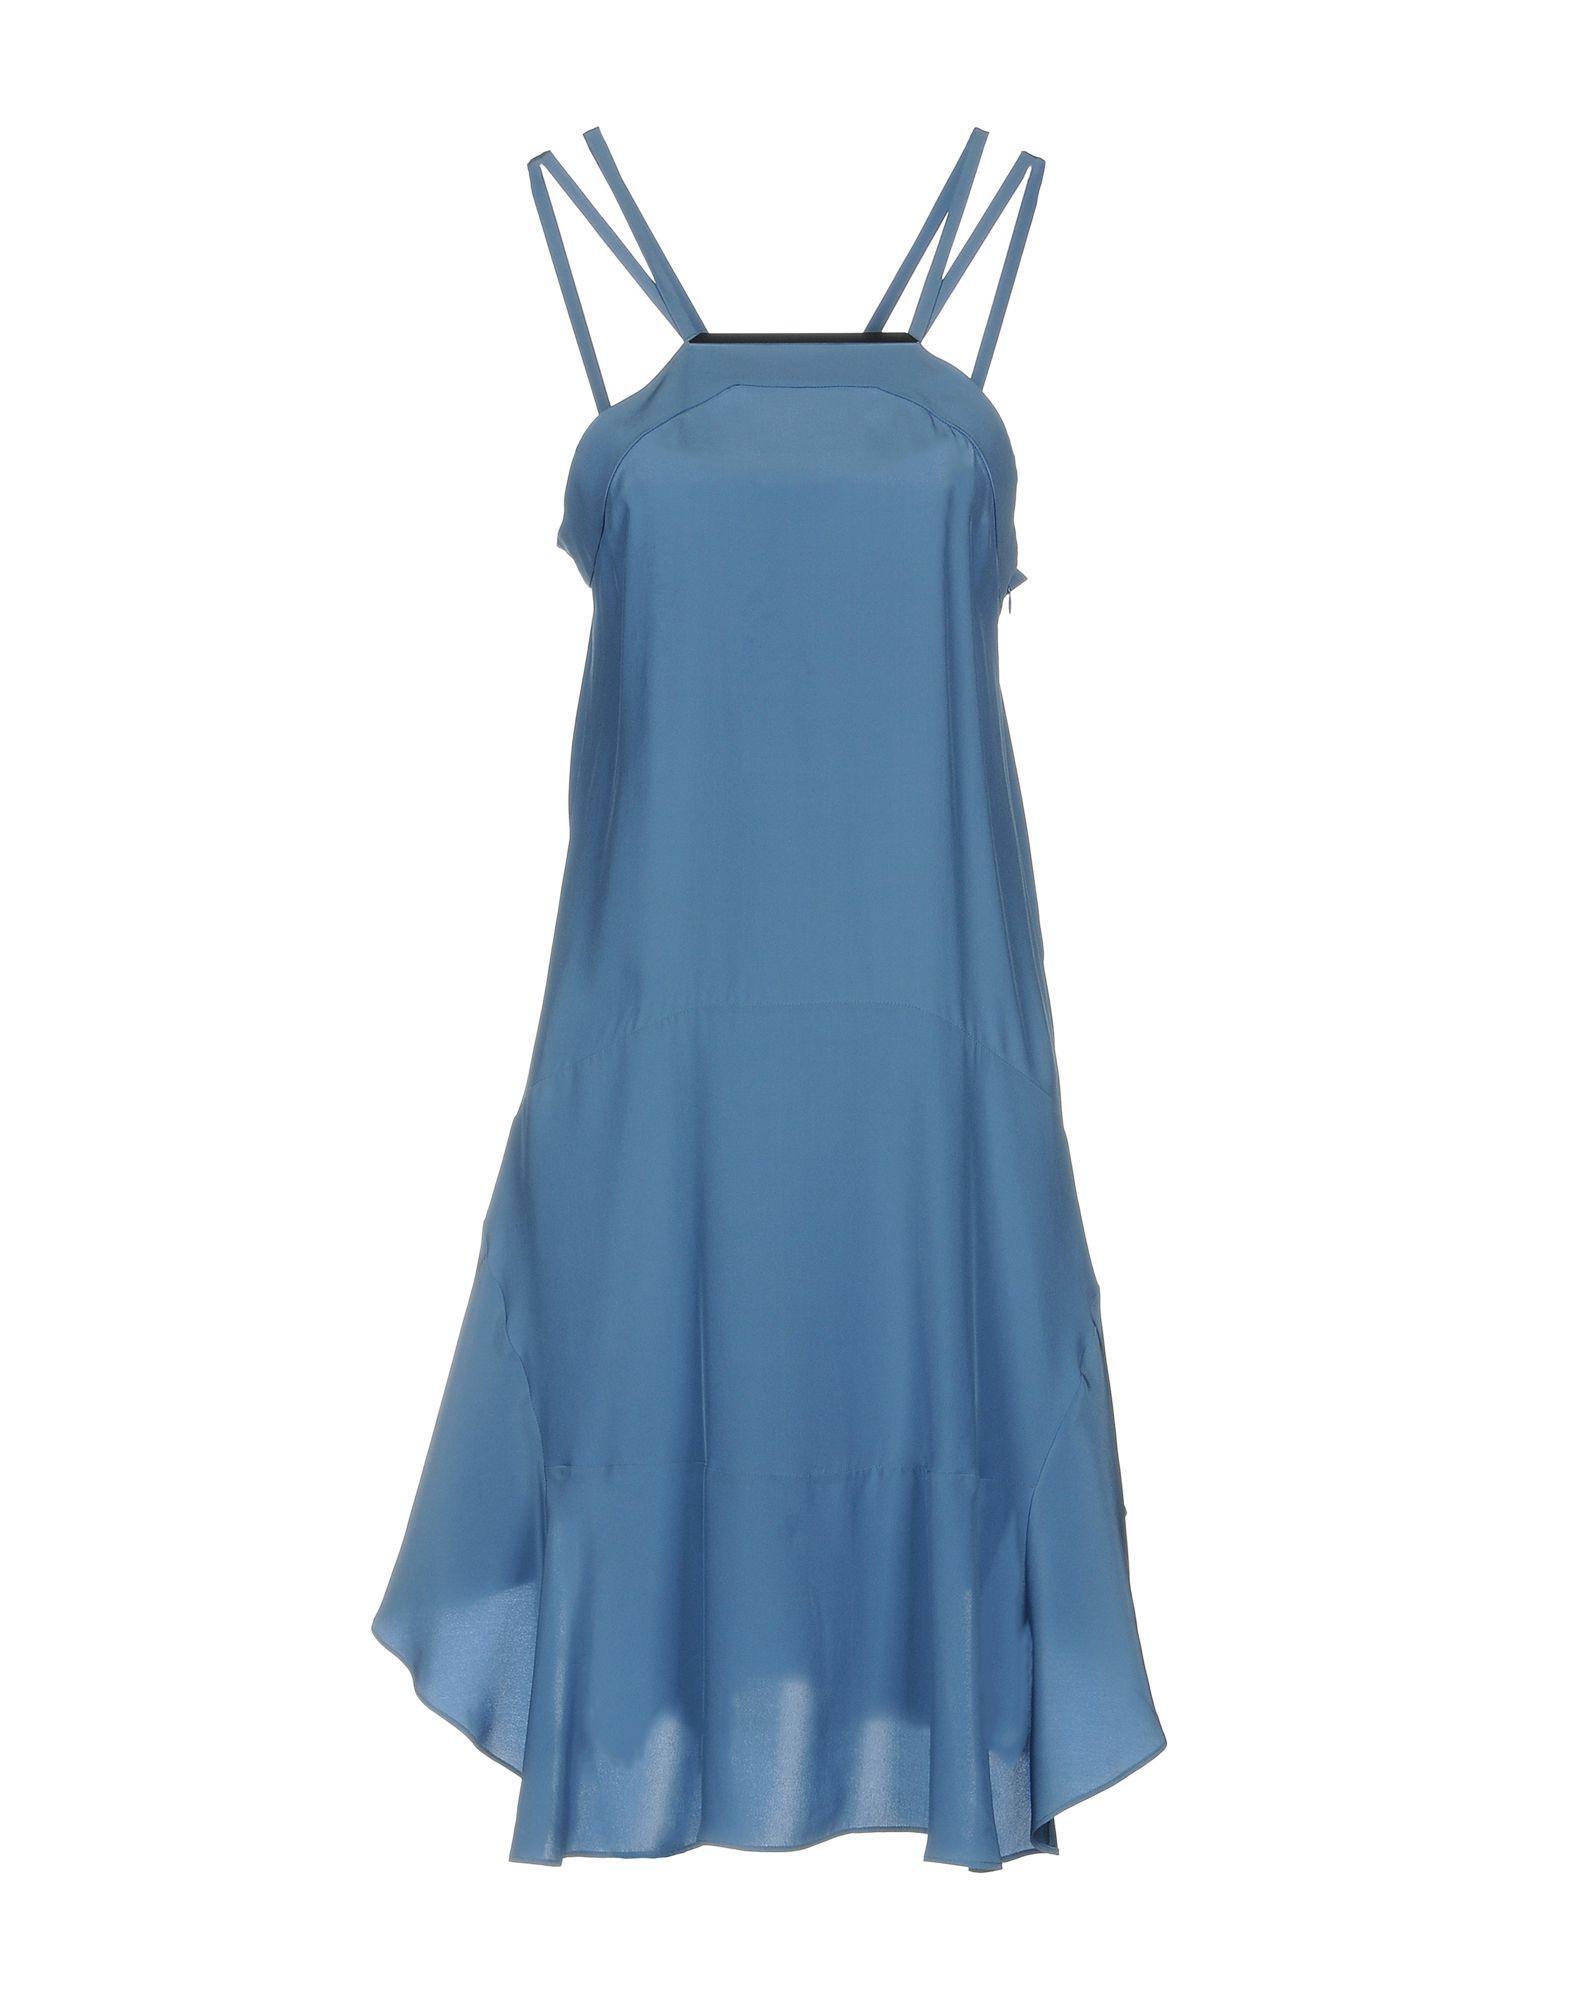 Barbara Bui Short Dress In Azure